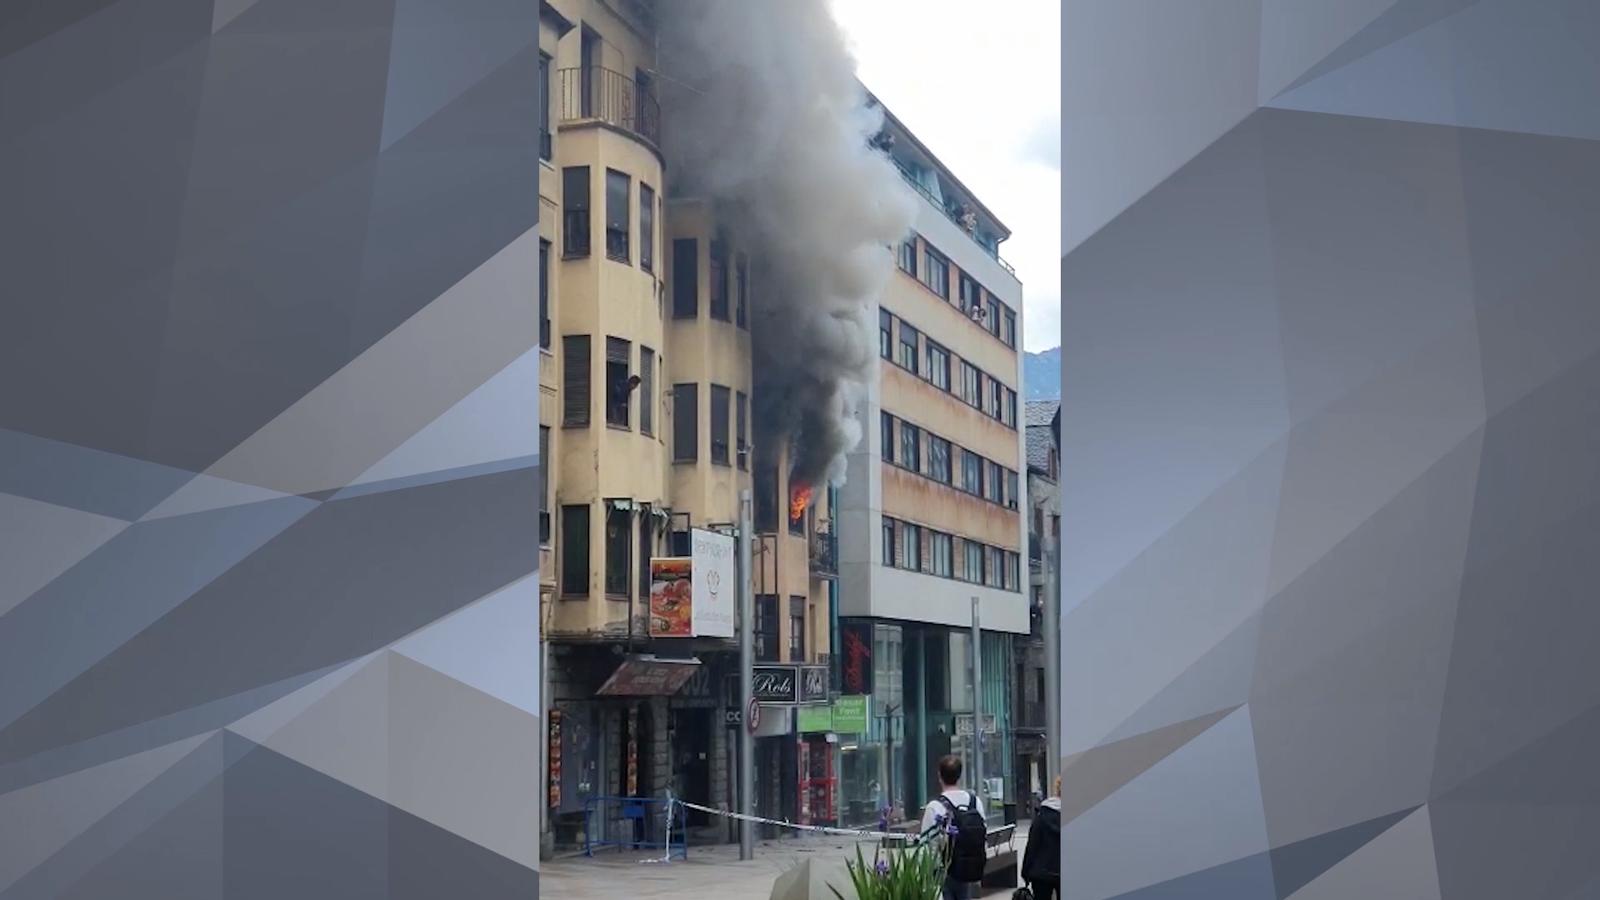 Incendi a l'avinguda Carlemany